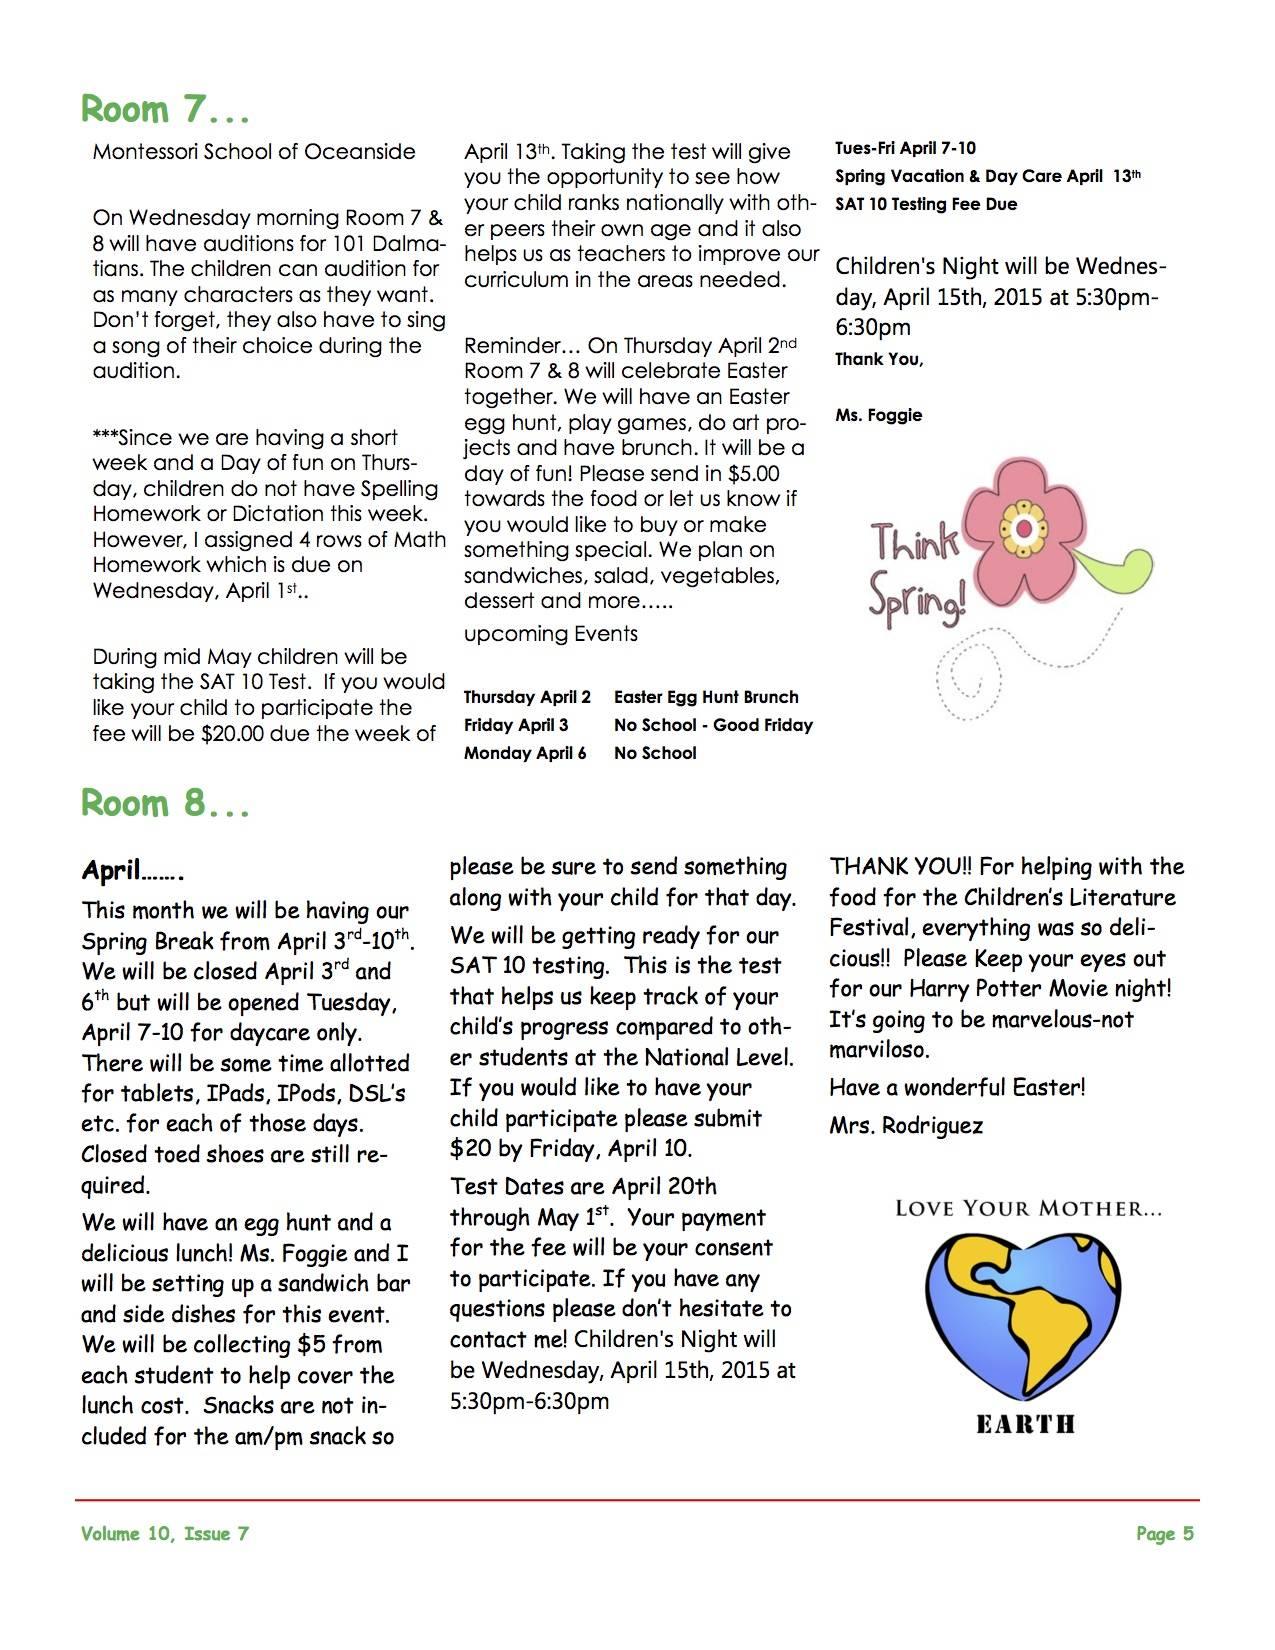 Attractive Math 4 Children.com Image - Math Worksheets - modopol.com